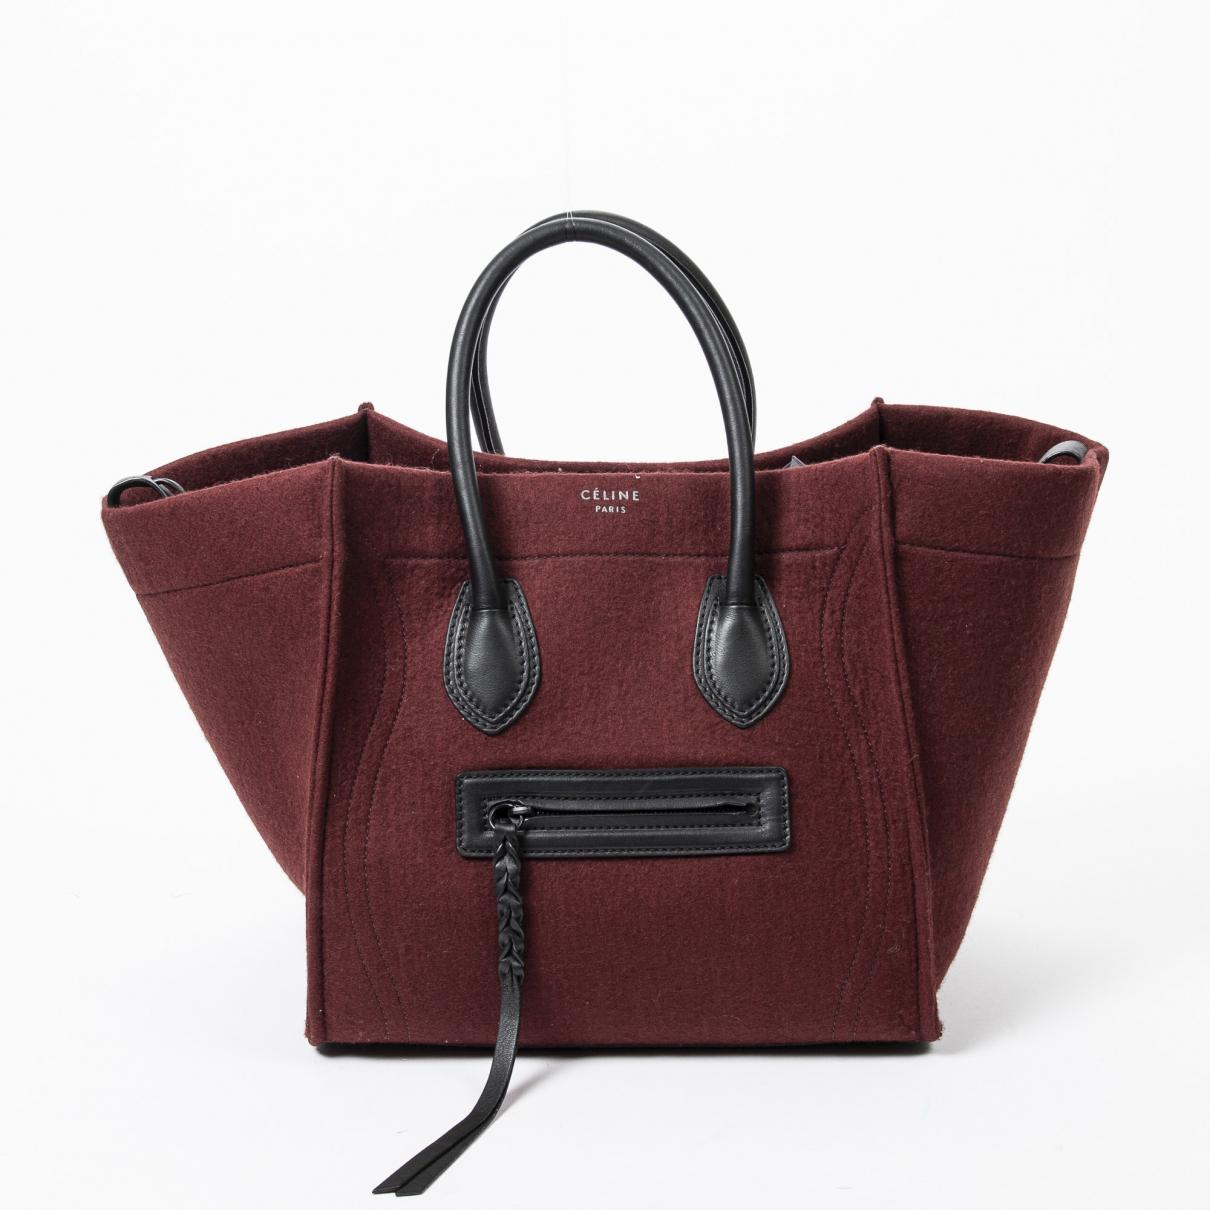 Celine - Sac a main Luggage Phantom pour femme en cuir - rouge